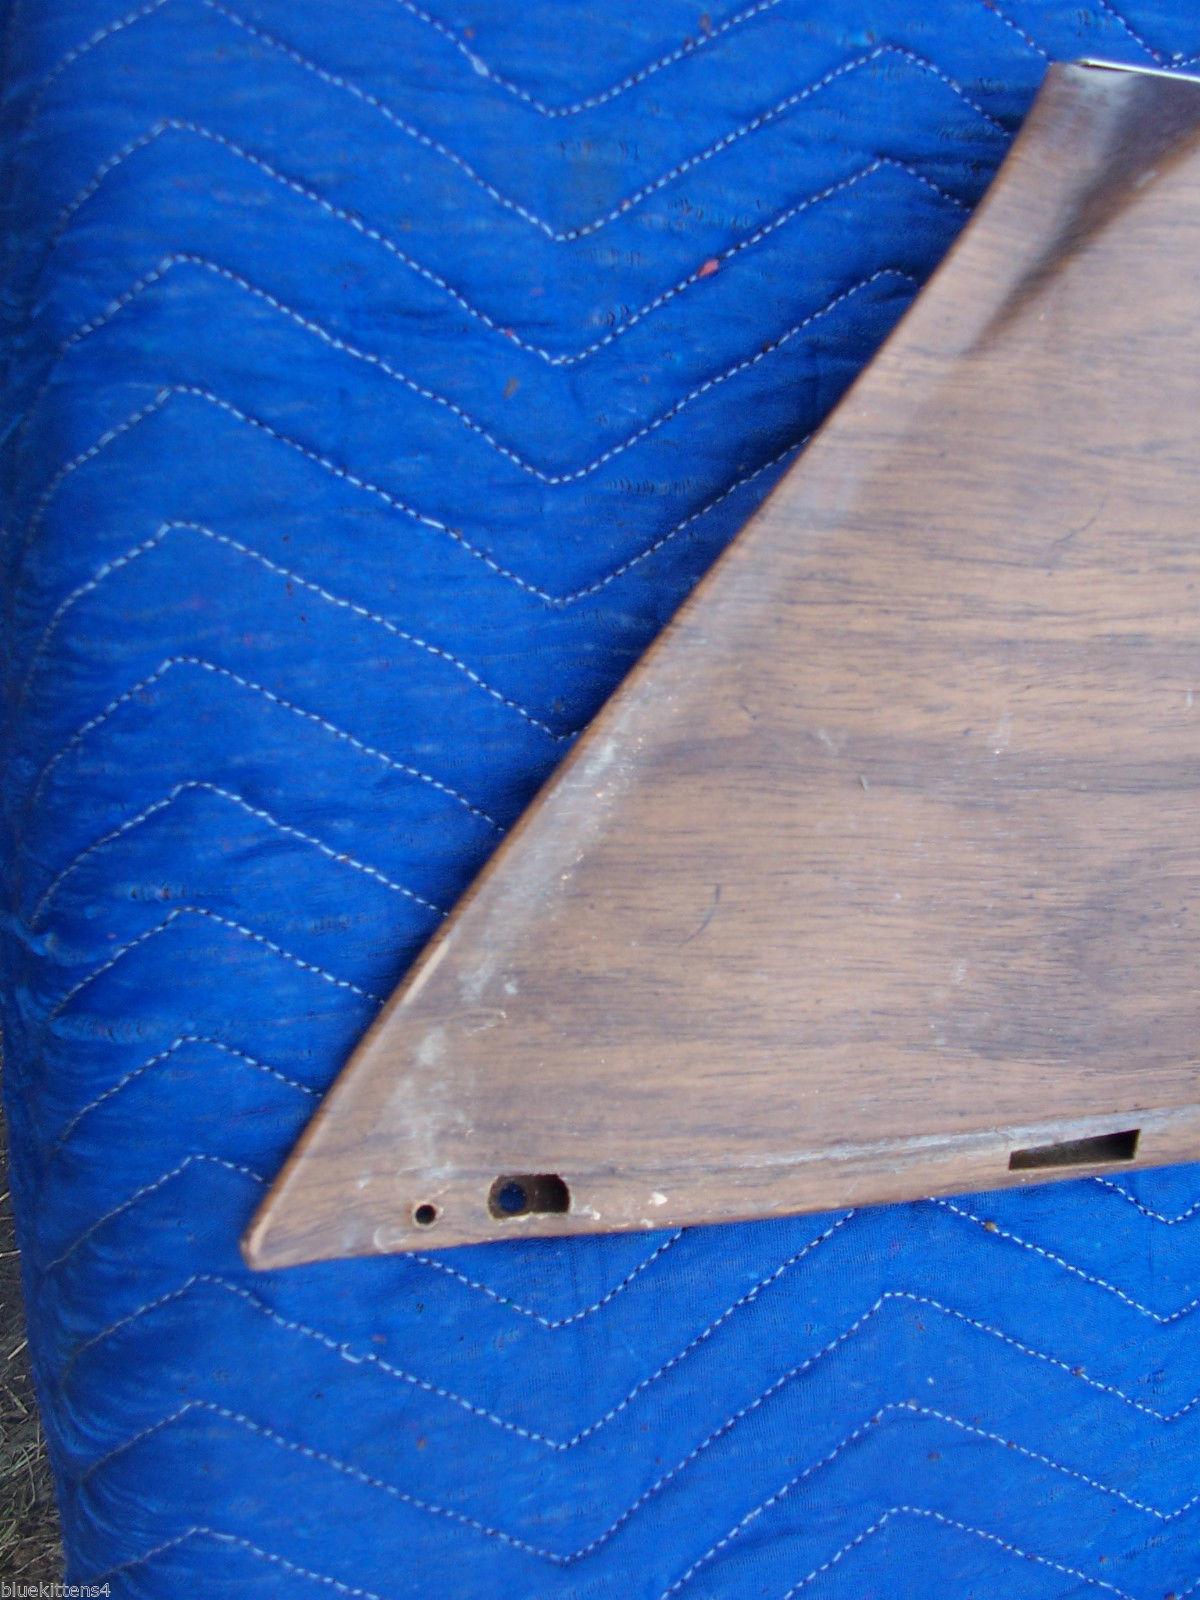 1975 SEDAN DEVILLE RIGHT FRONT DOOR PANEL UPPER HAS TEAR WEAR OEM USED CADILLAC image 5